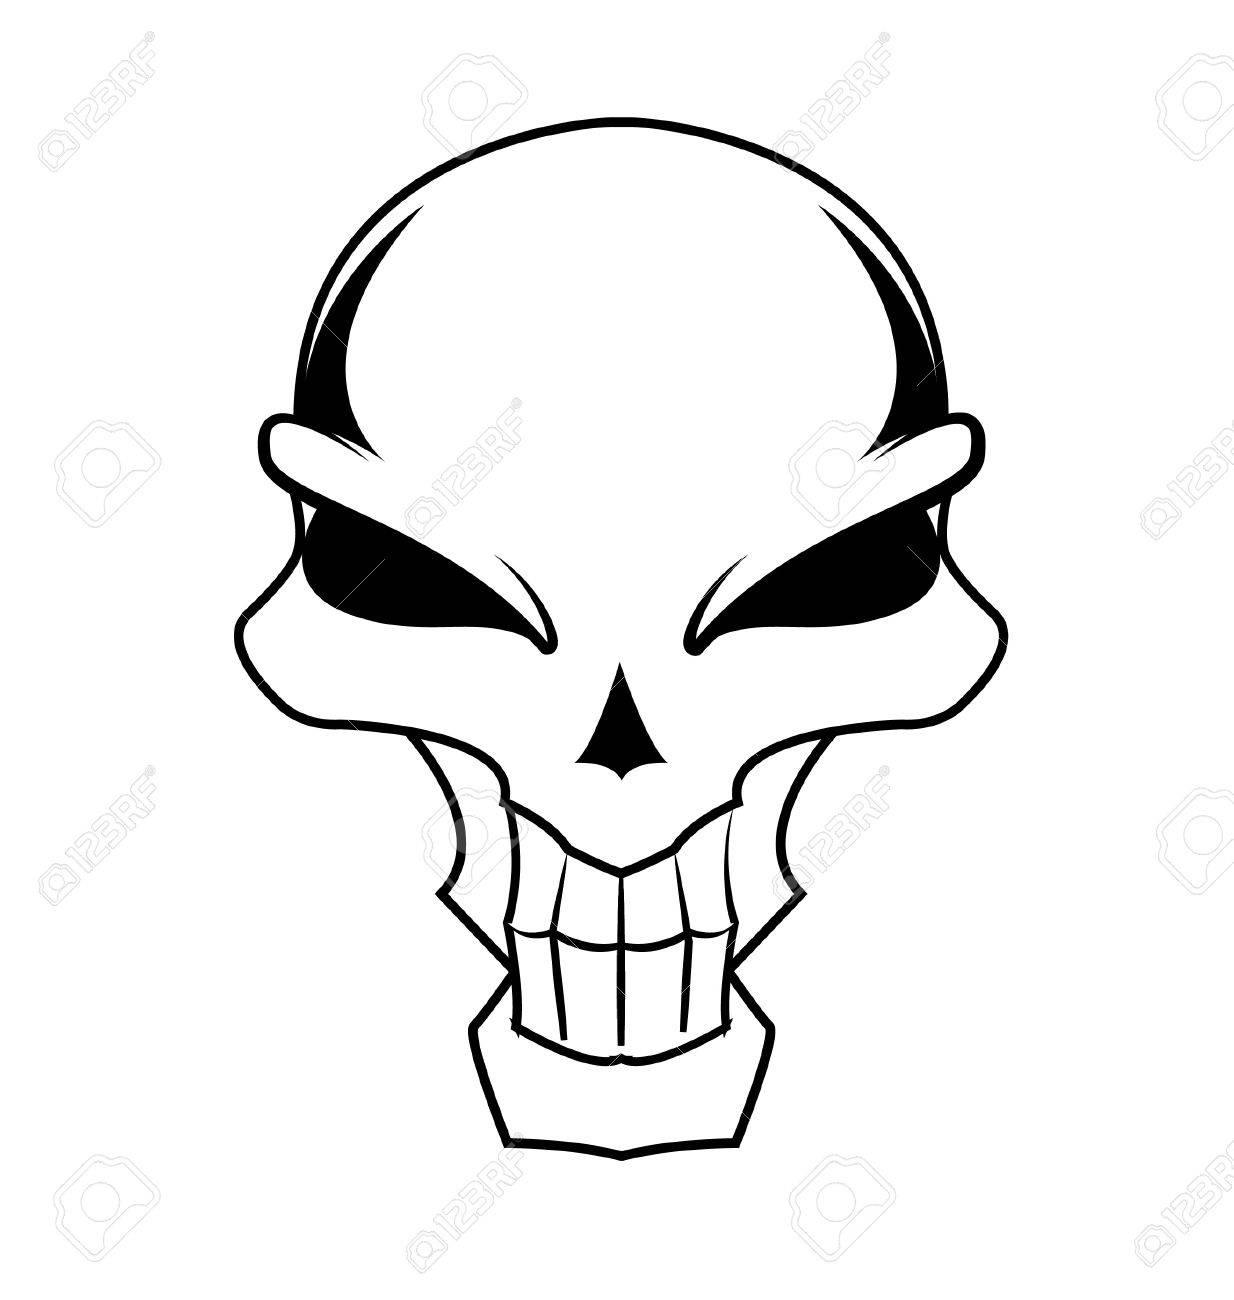 simple black skull Stock Vector - 19732197